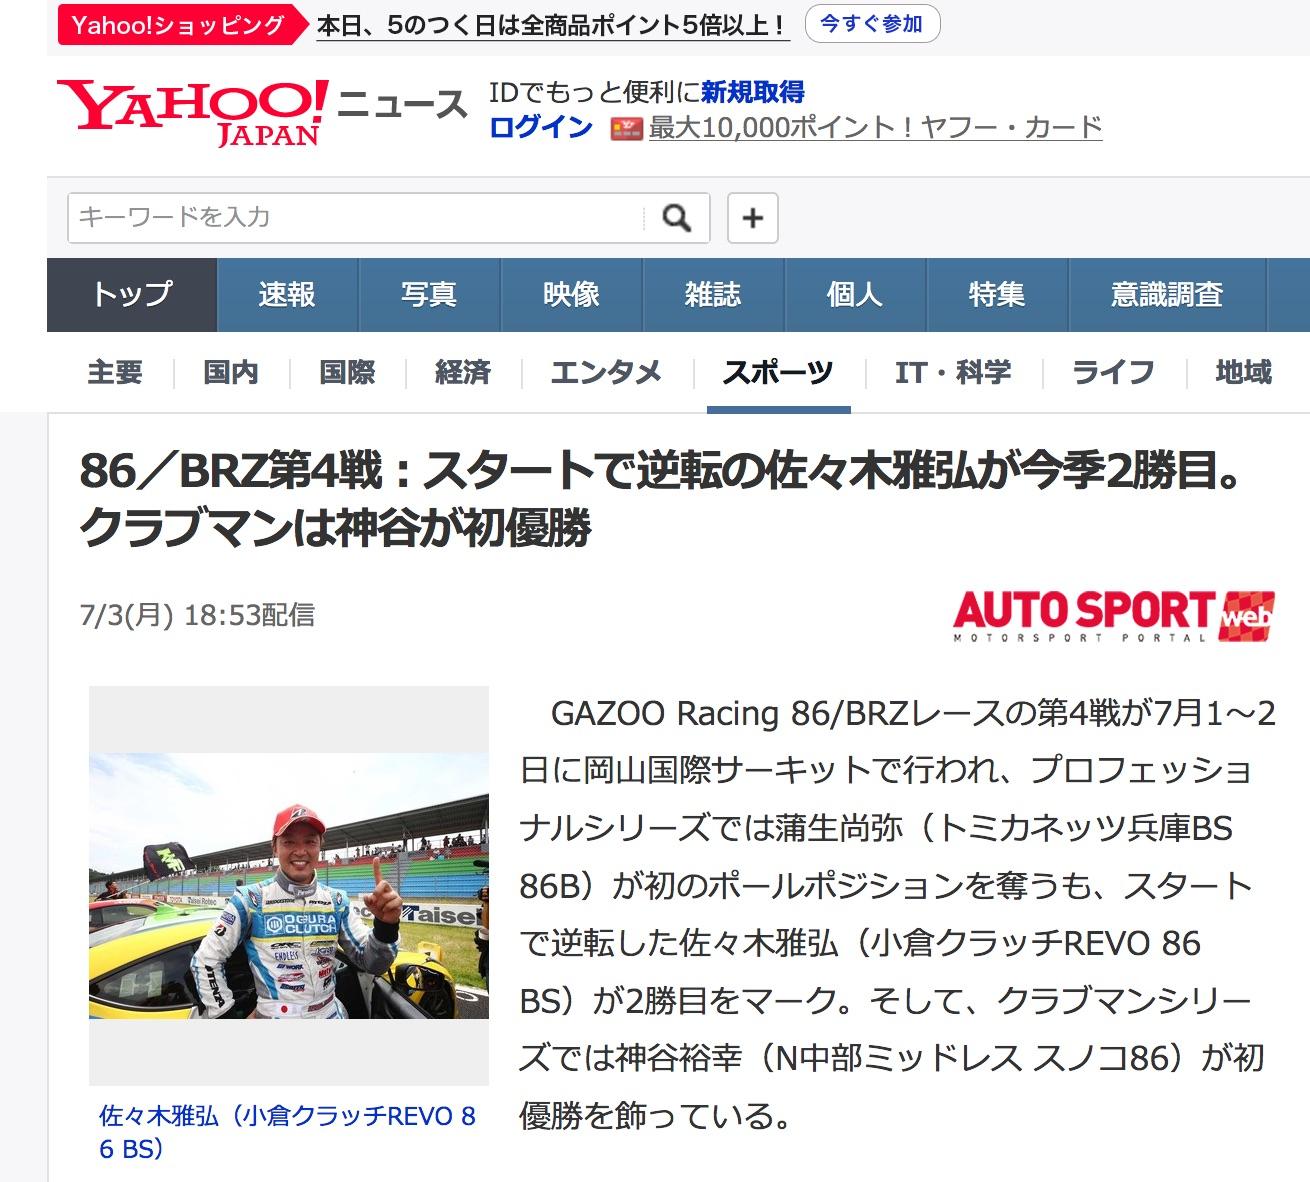 Yahoo! news 86/BRZ第4戦:スタートで逆転の佐々木雅弘が今季2勝目。